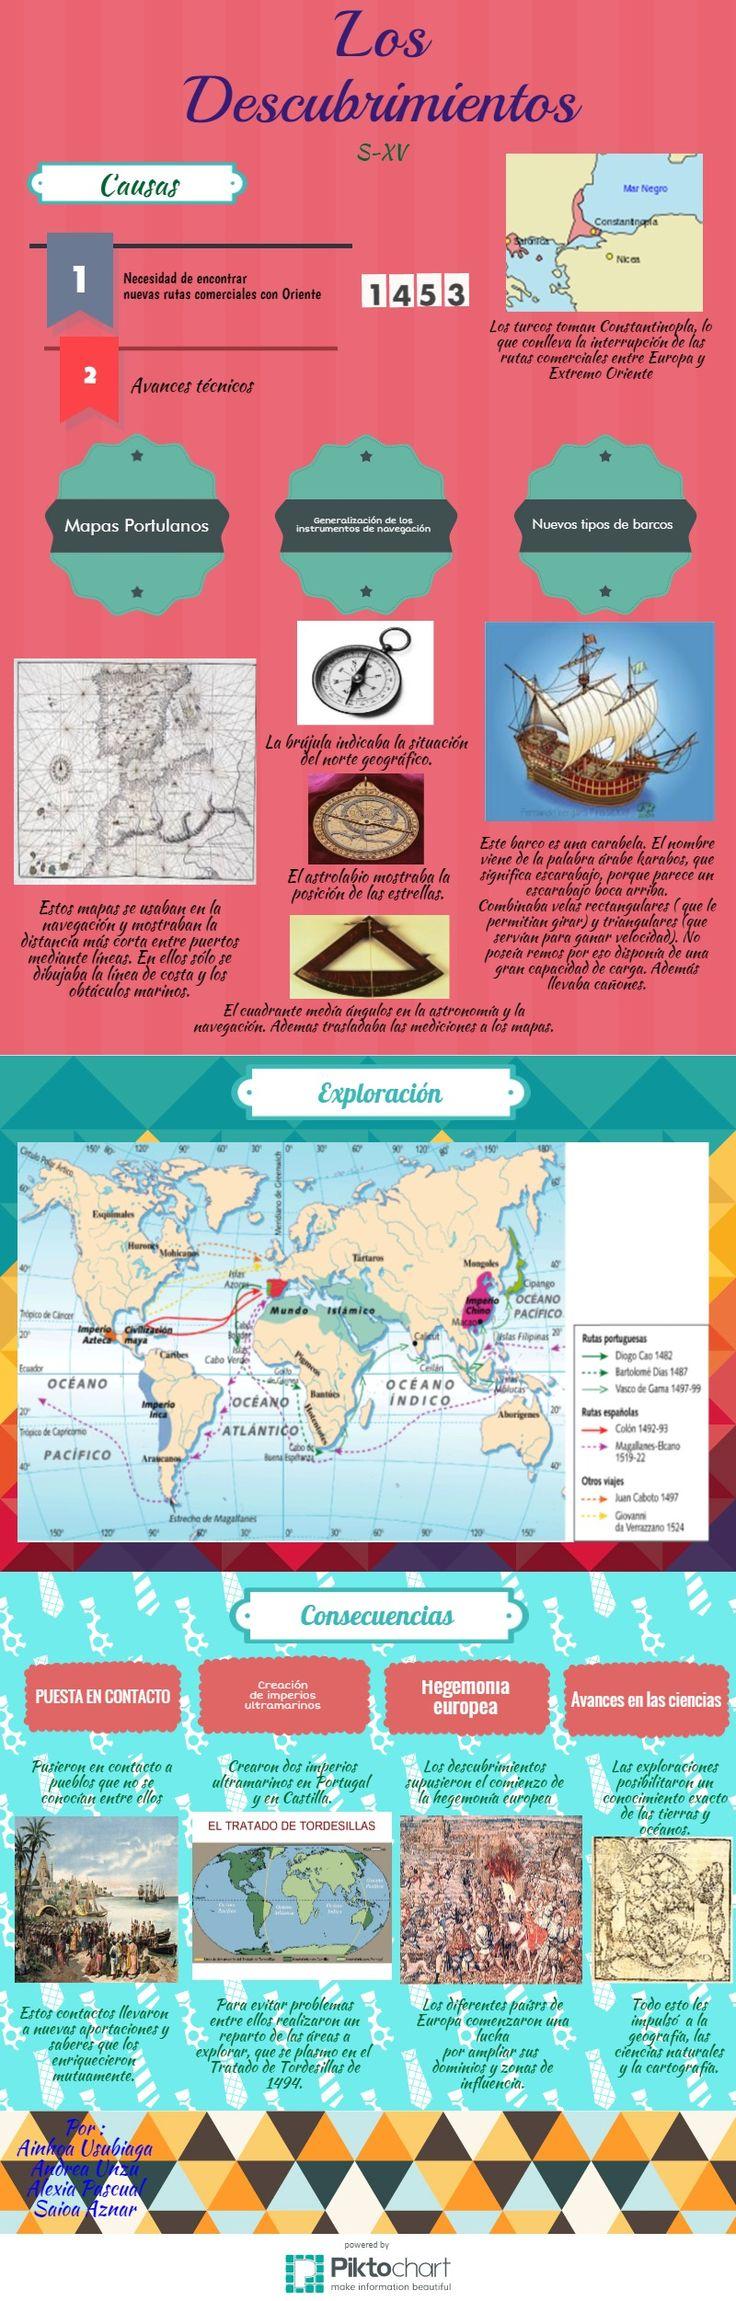 12 best descubrimientos geogrficos siglo xv images on pinterest descubrimientos piktochart infographic editor gumiabroncs Image collections